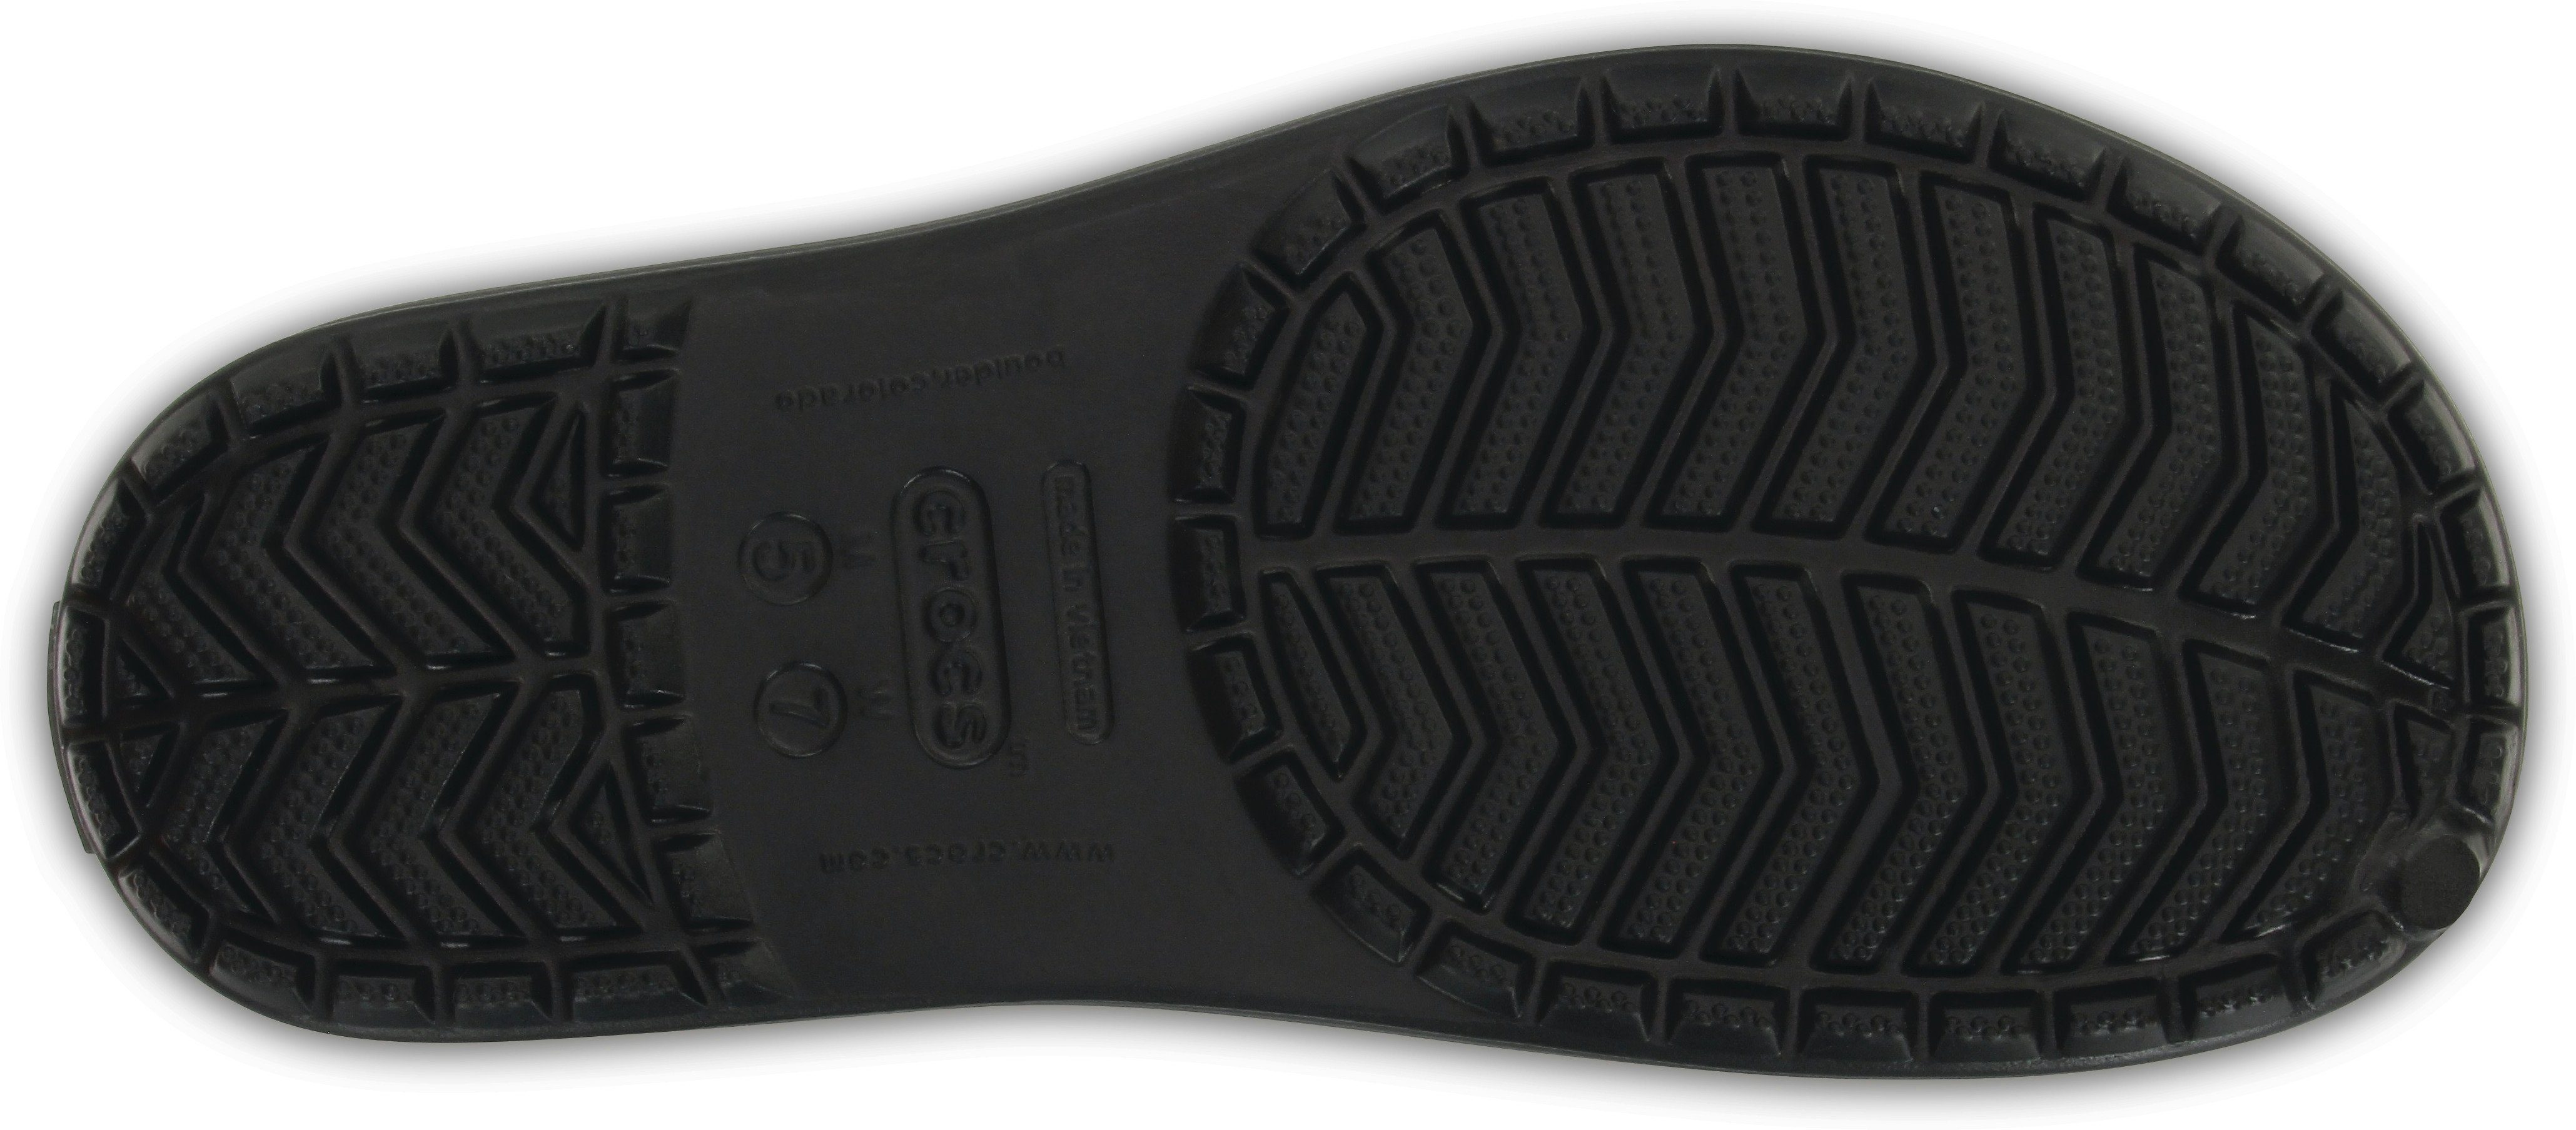 Crocs Pantolette Crocband II Slide online kaufen  grau